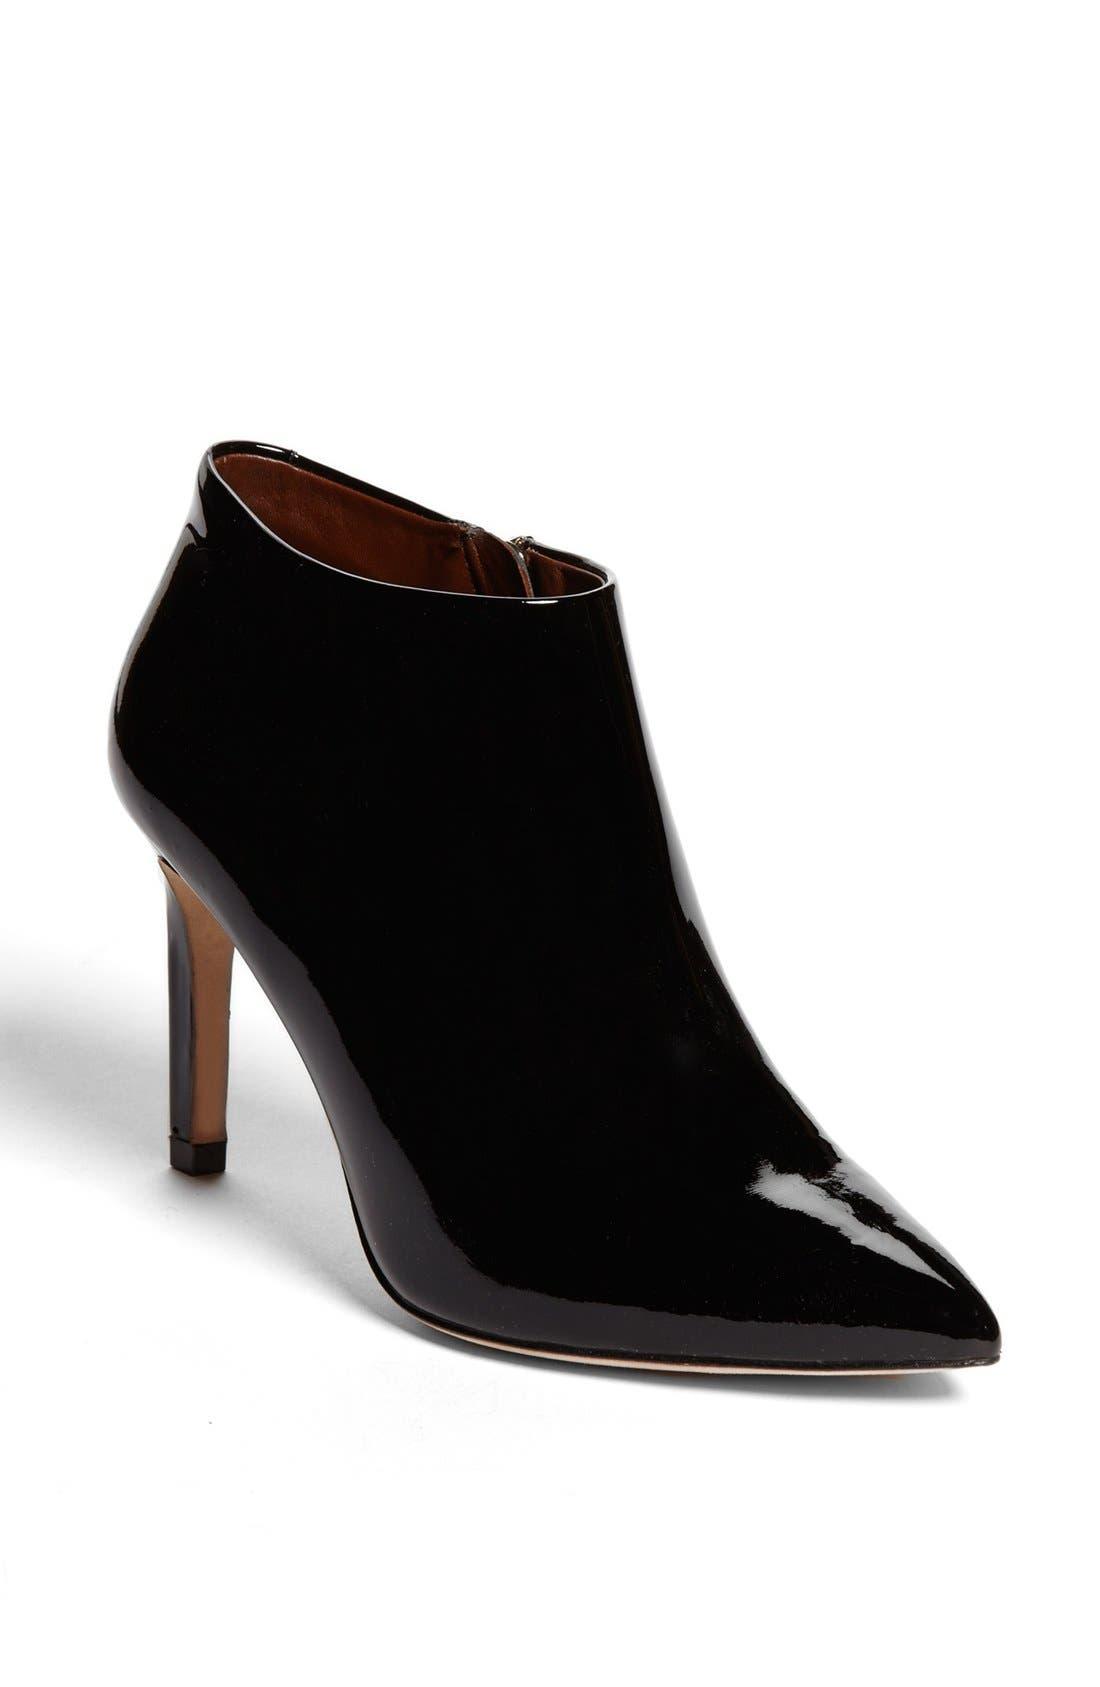 Main Image - VC Signature 'Gordina' Patent Leather Bootie (Nordstrom Exclusive)